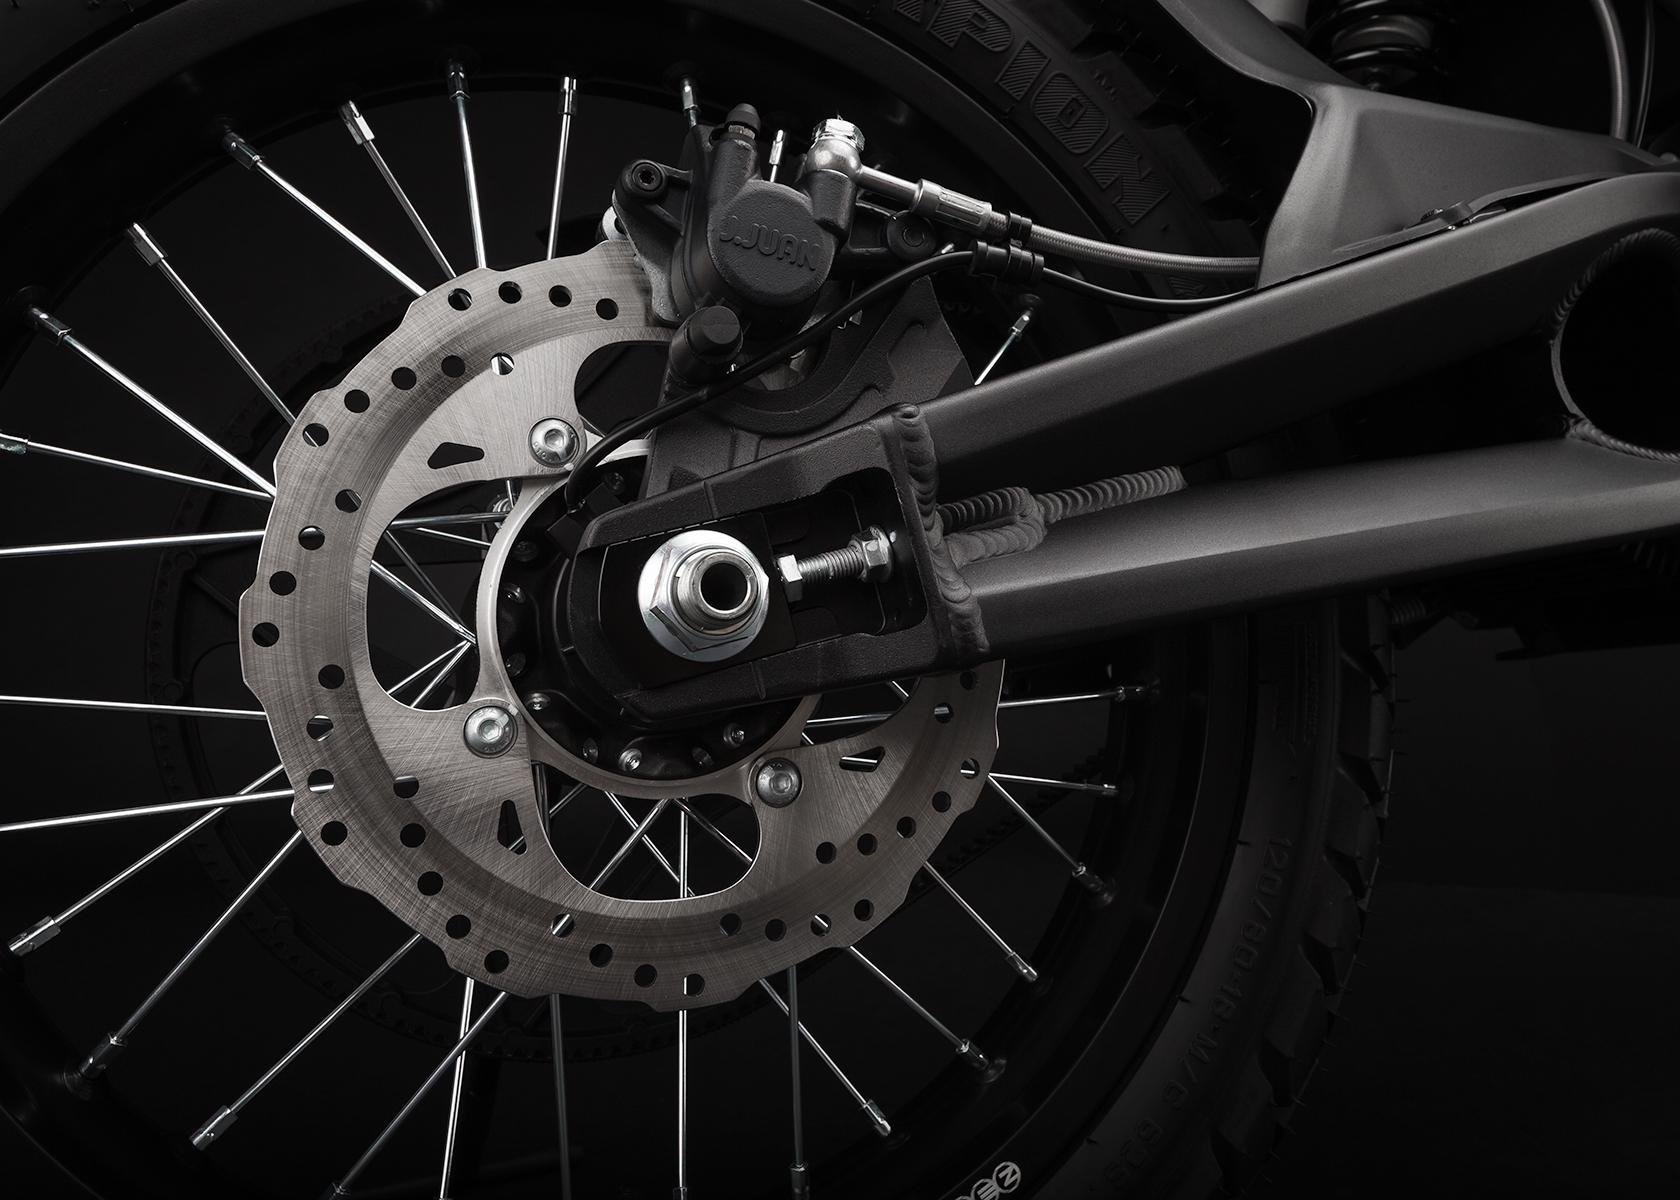 2015 Zero FX Electric Motorcycle: Rear Brake